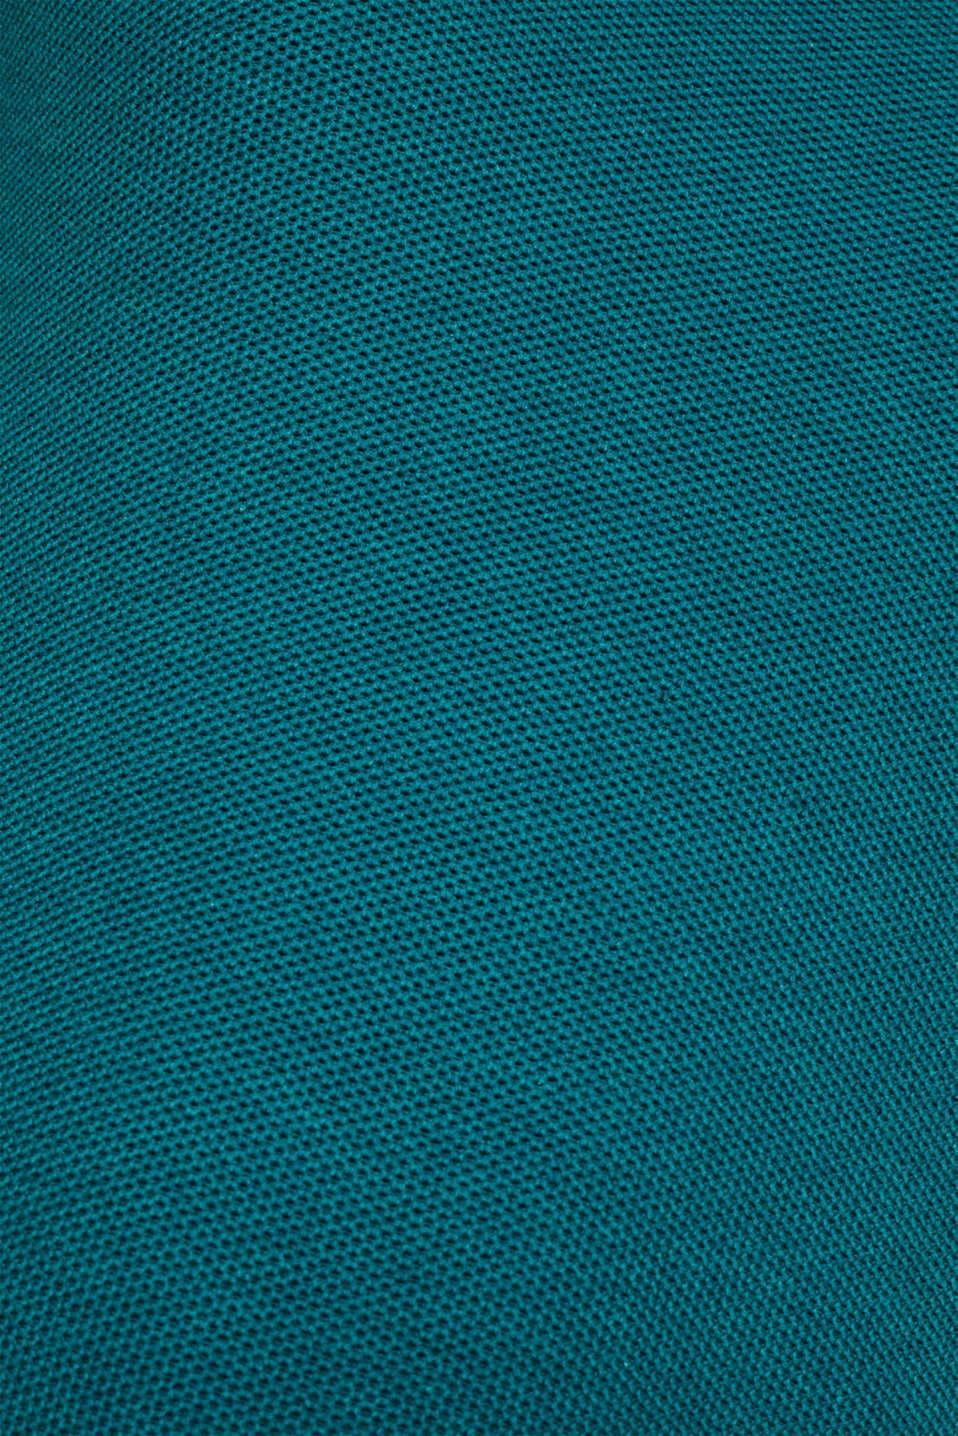 Textured jumper made of 100% cotton, TEAL BLUE 5, detail image number 4